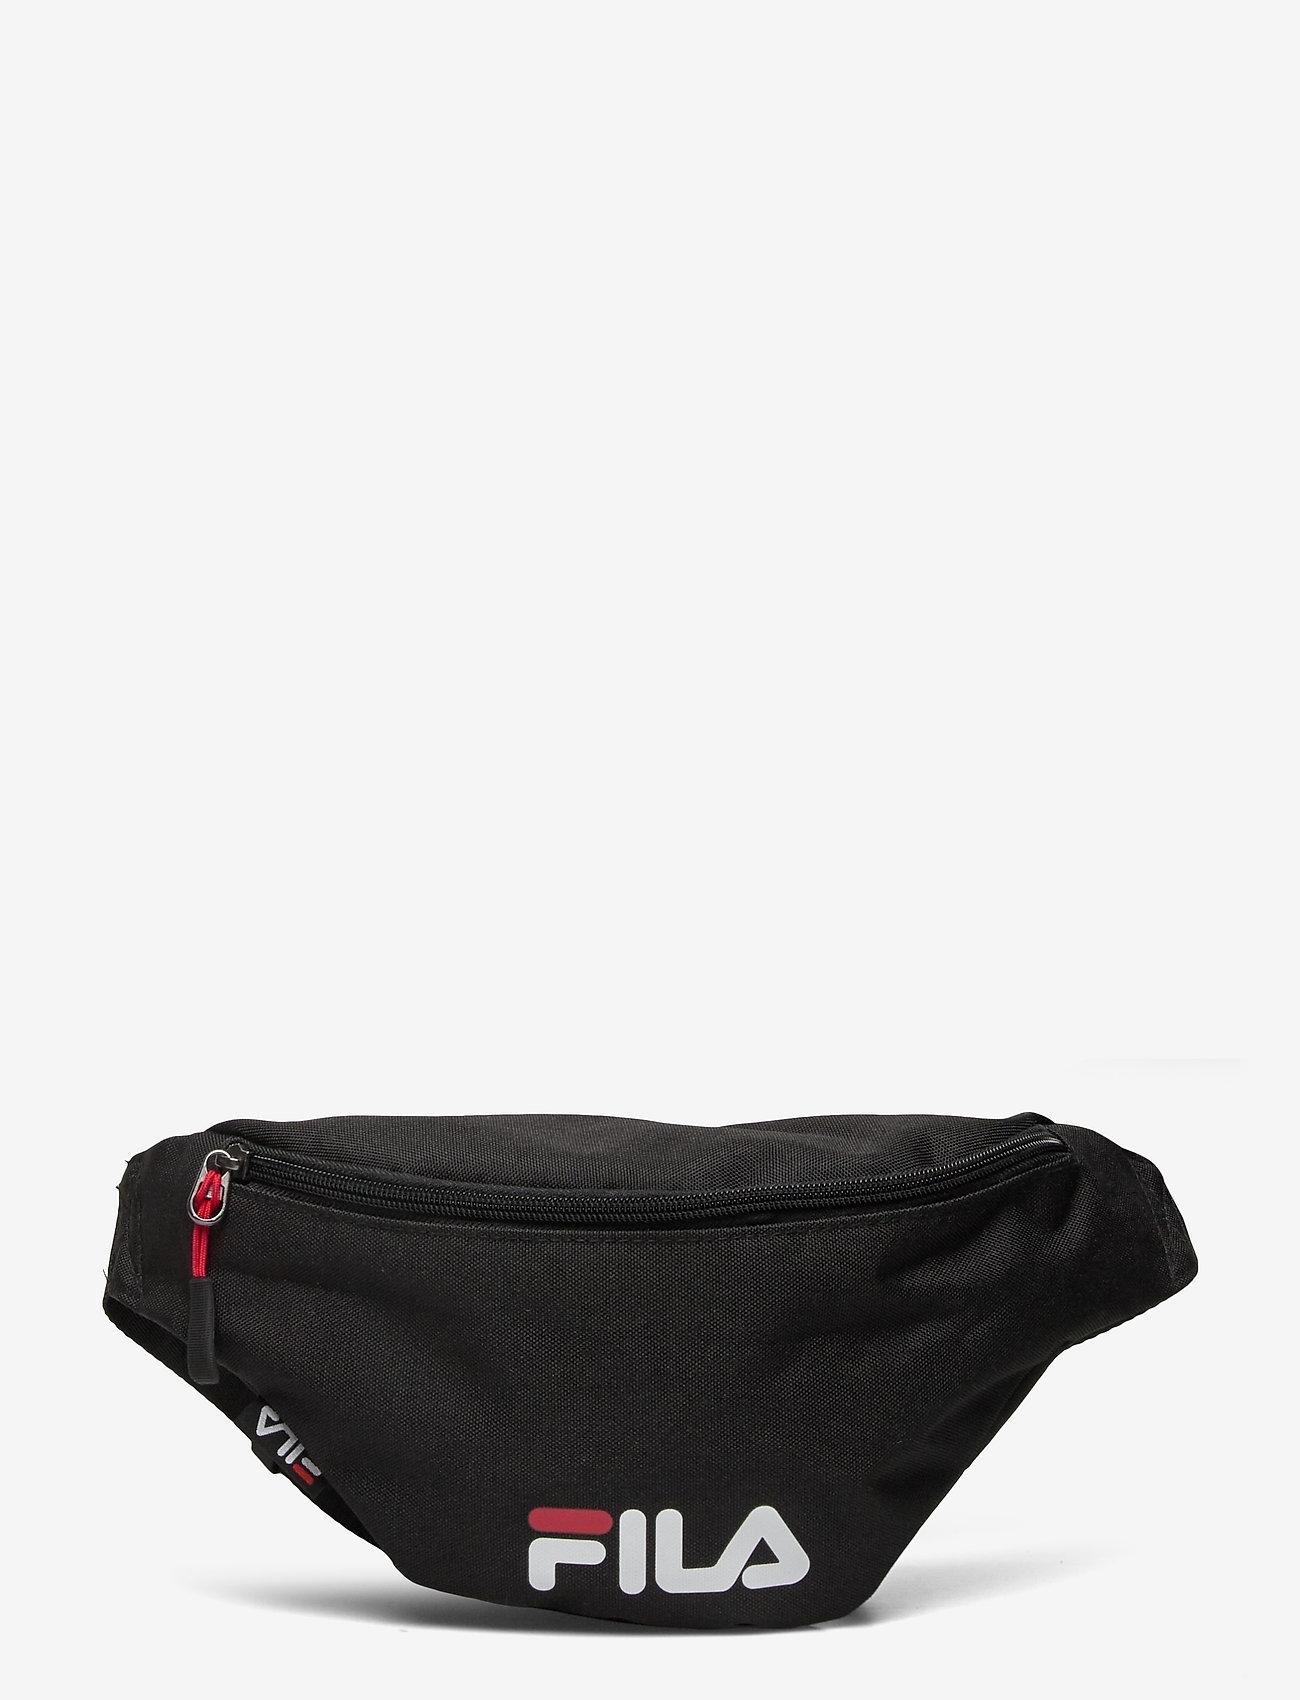 FILA - WAIST BAG SLIM (small logo) - vyölaukut - black - 0